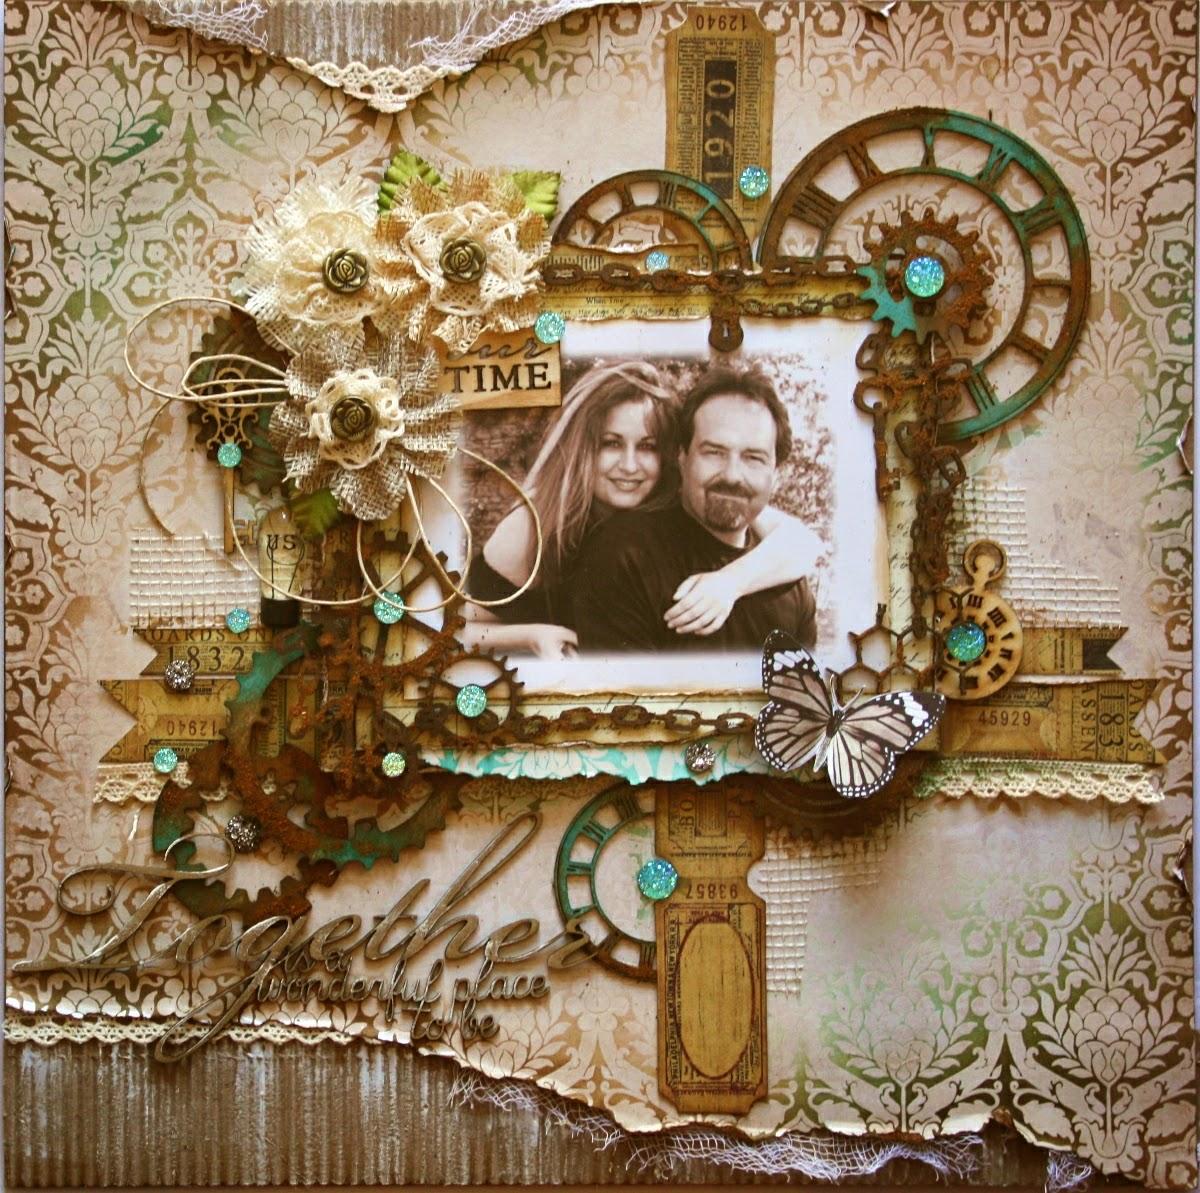 Scrapbook ideas romantic - Masculine Romantic The Scrapbook Diaries Plus A New Stamp